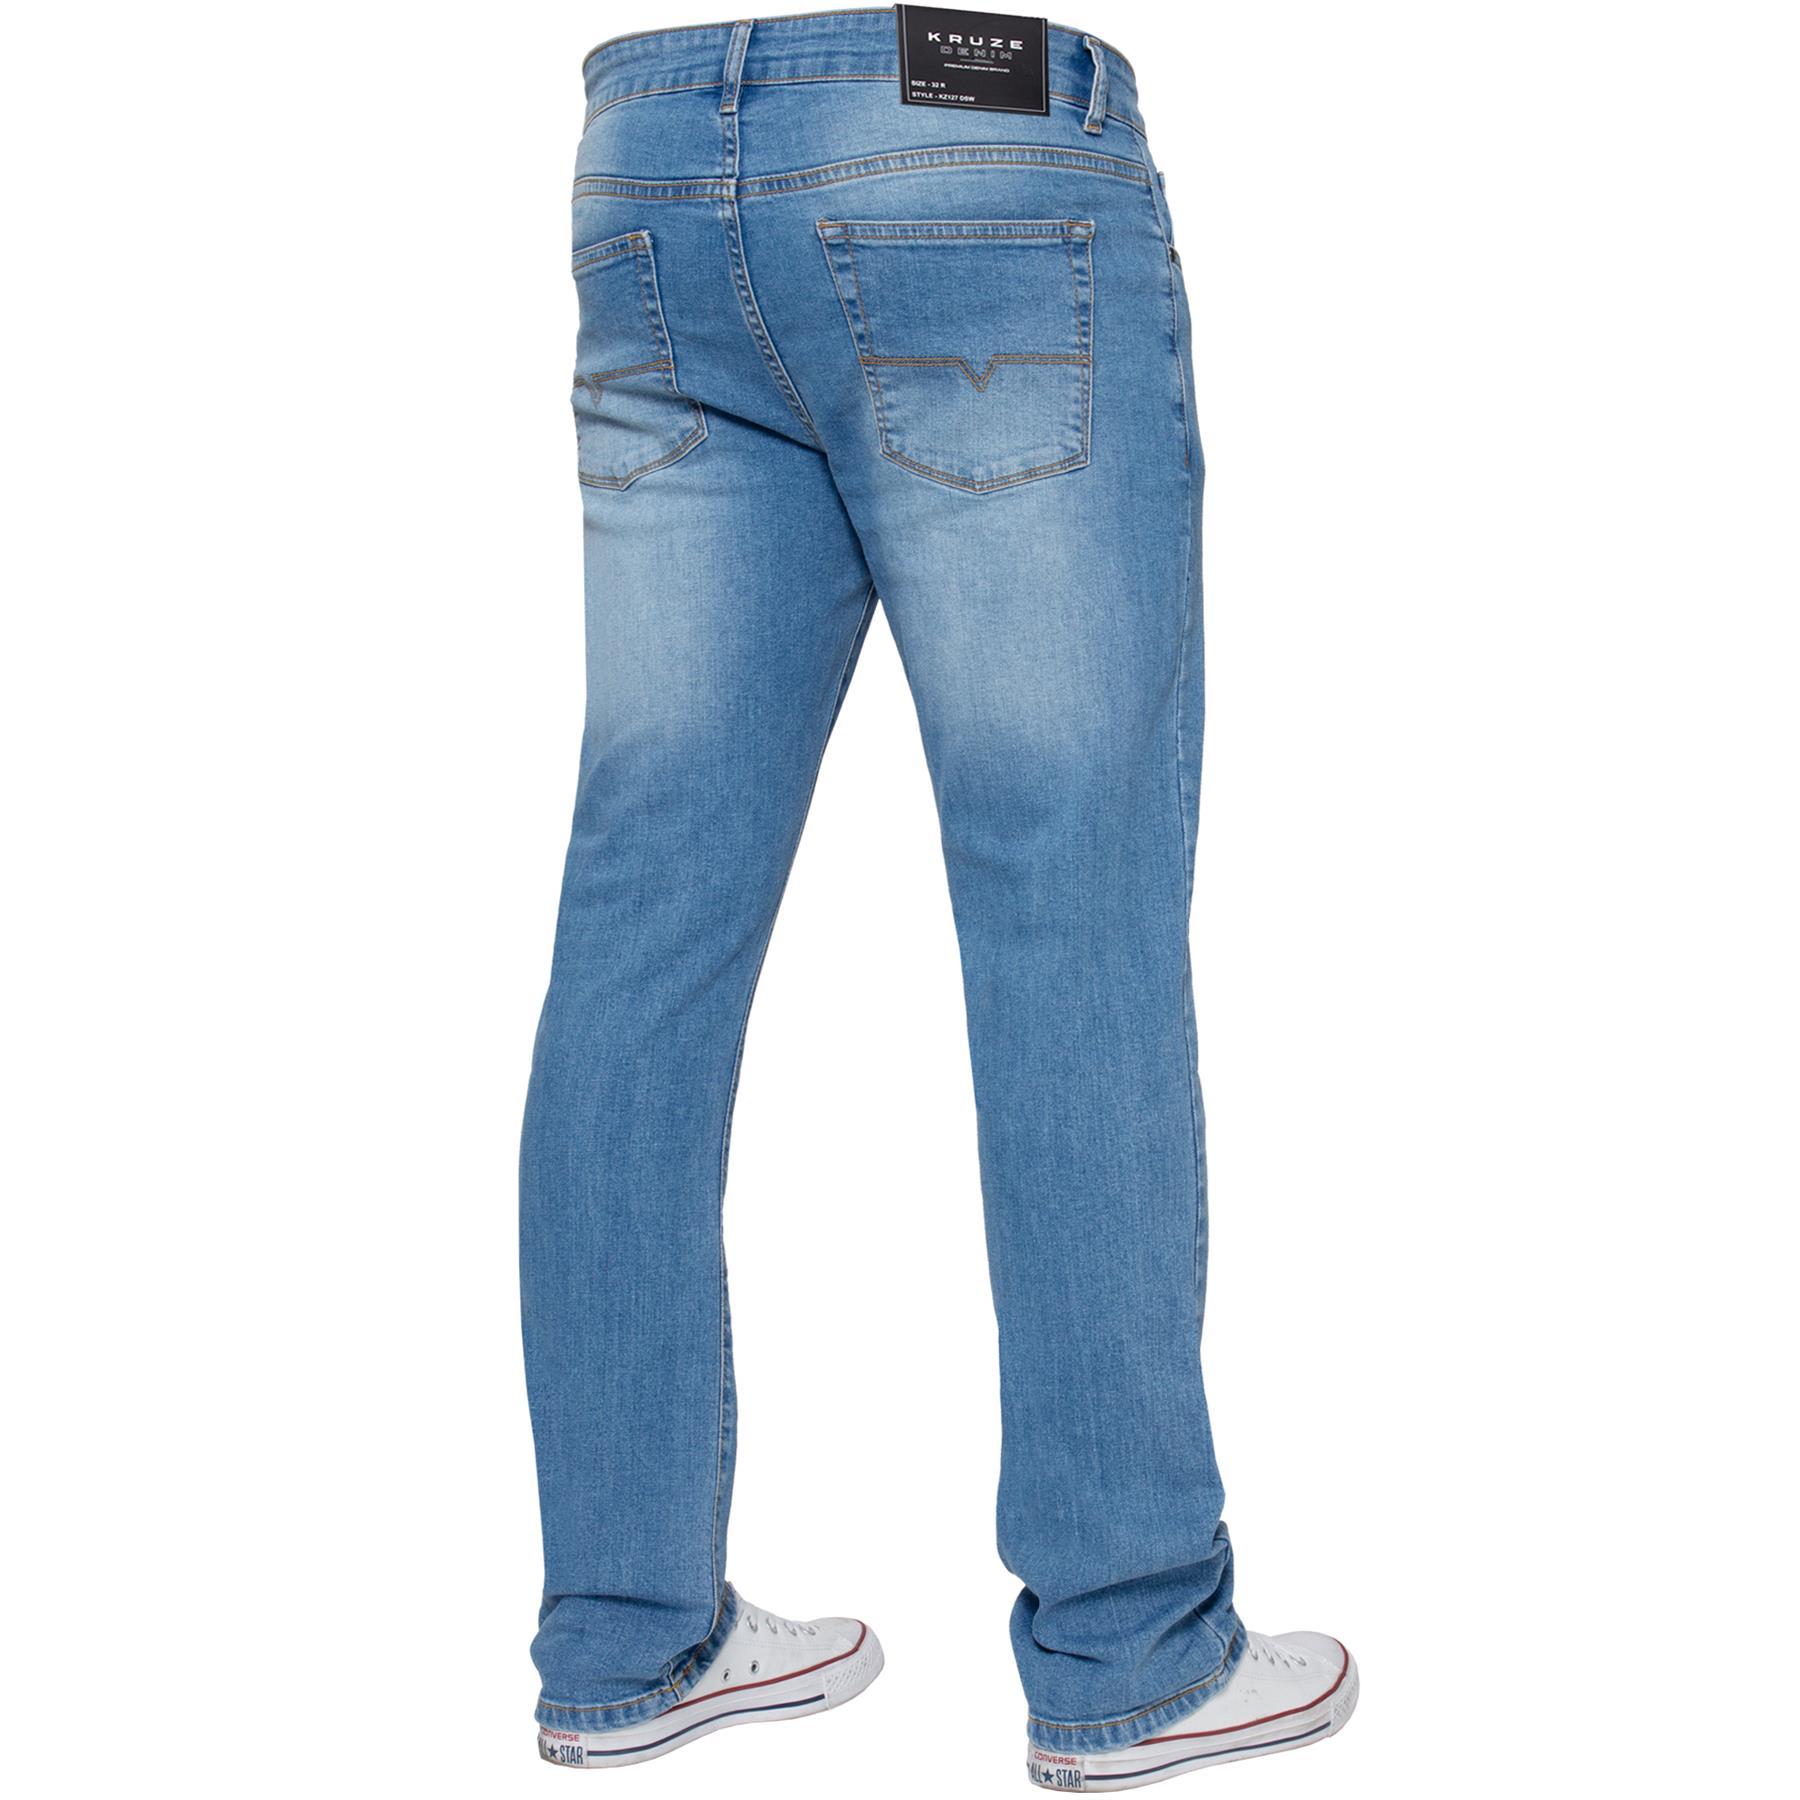 Para-Hombre-Pierna-Recta-Bootcut-Stretch-Denim-Regulares-Pantalon-de-trabajo-Kruze-Todas-Cinturas miniatura 34